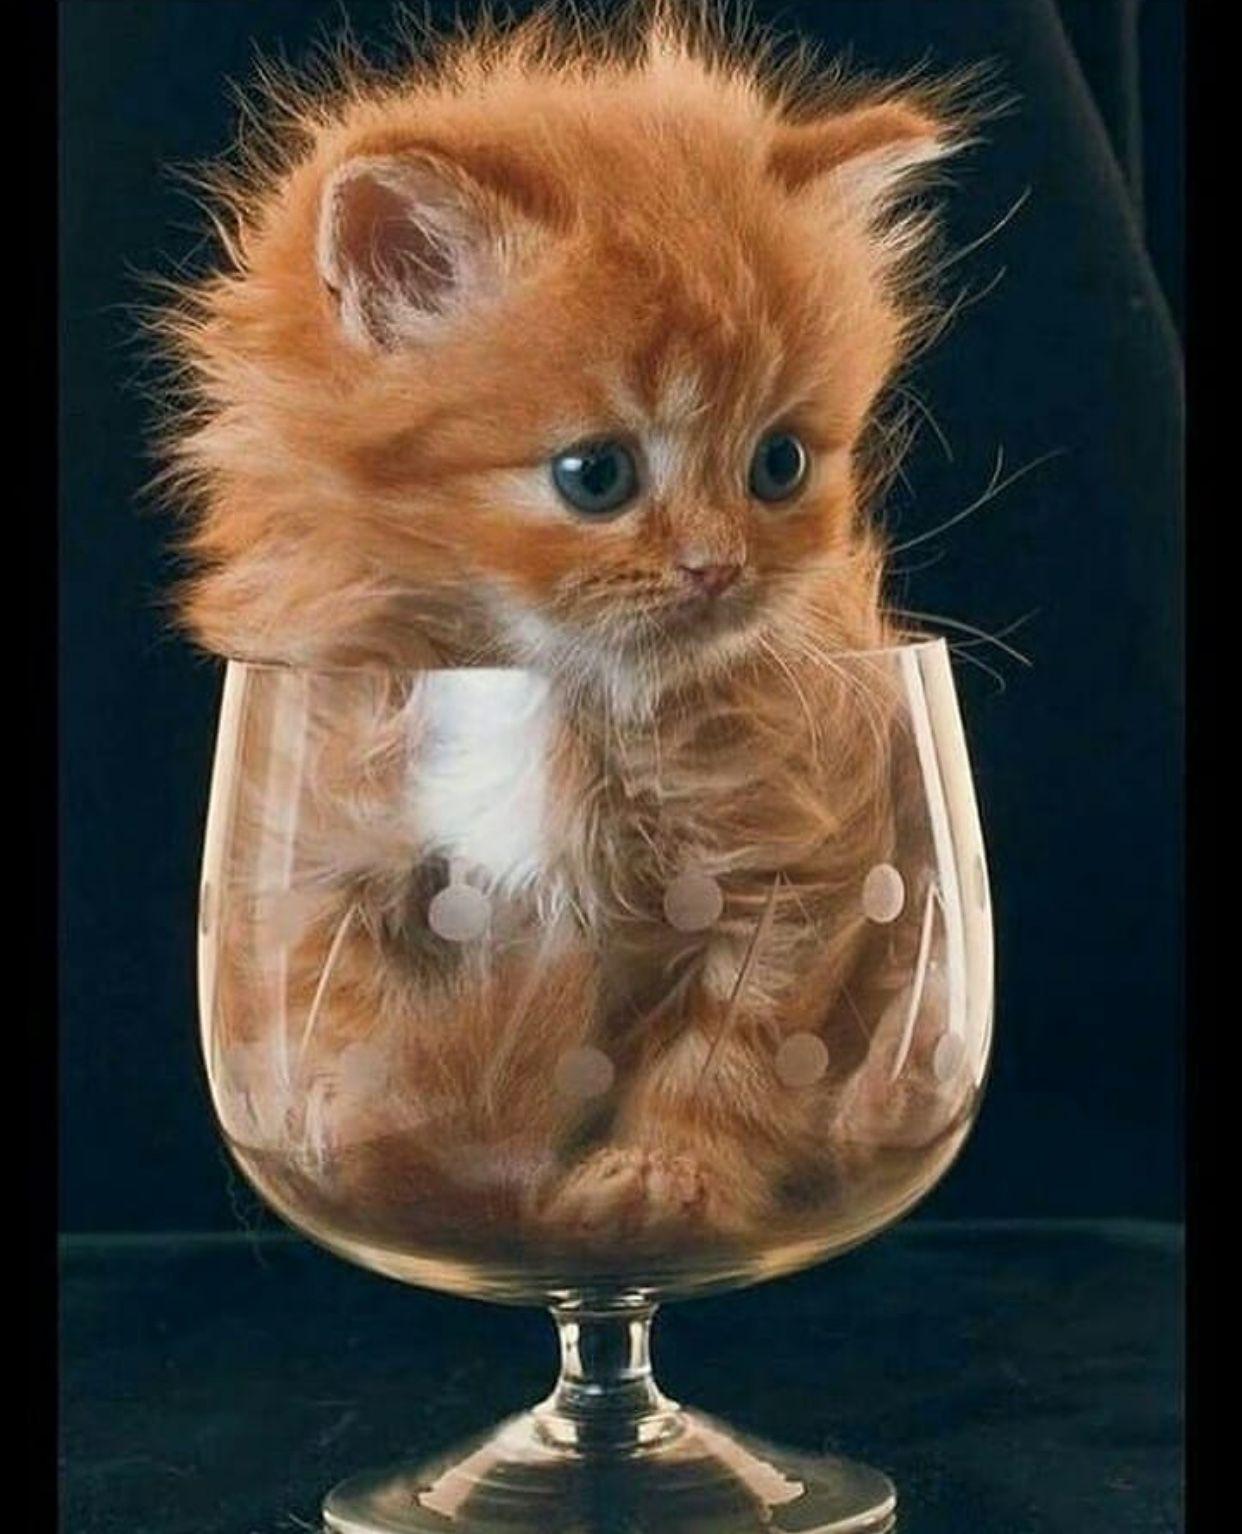 Pin by Kayo Tamimi on Cute animal Cute cats, Cute